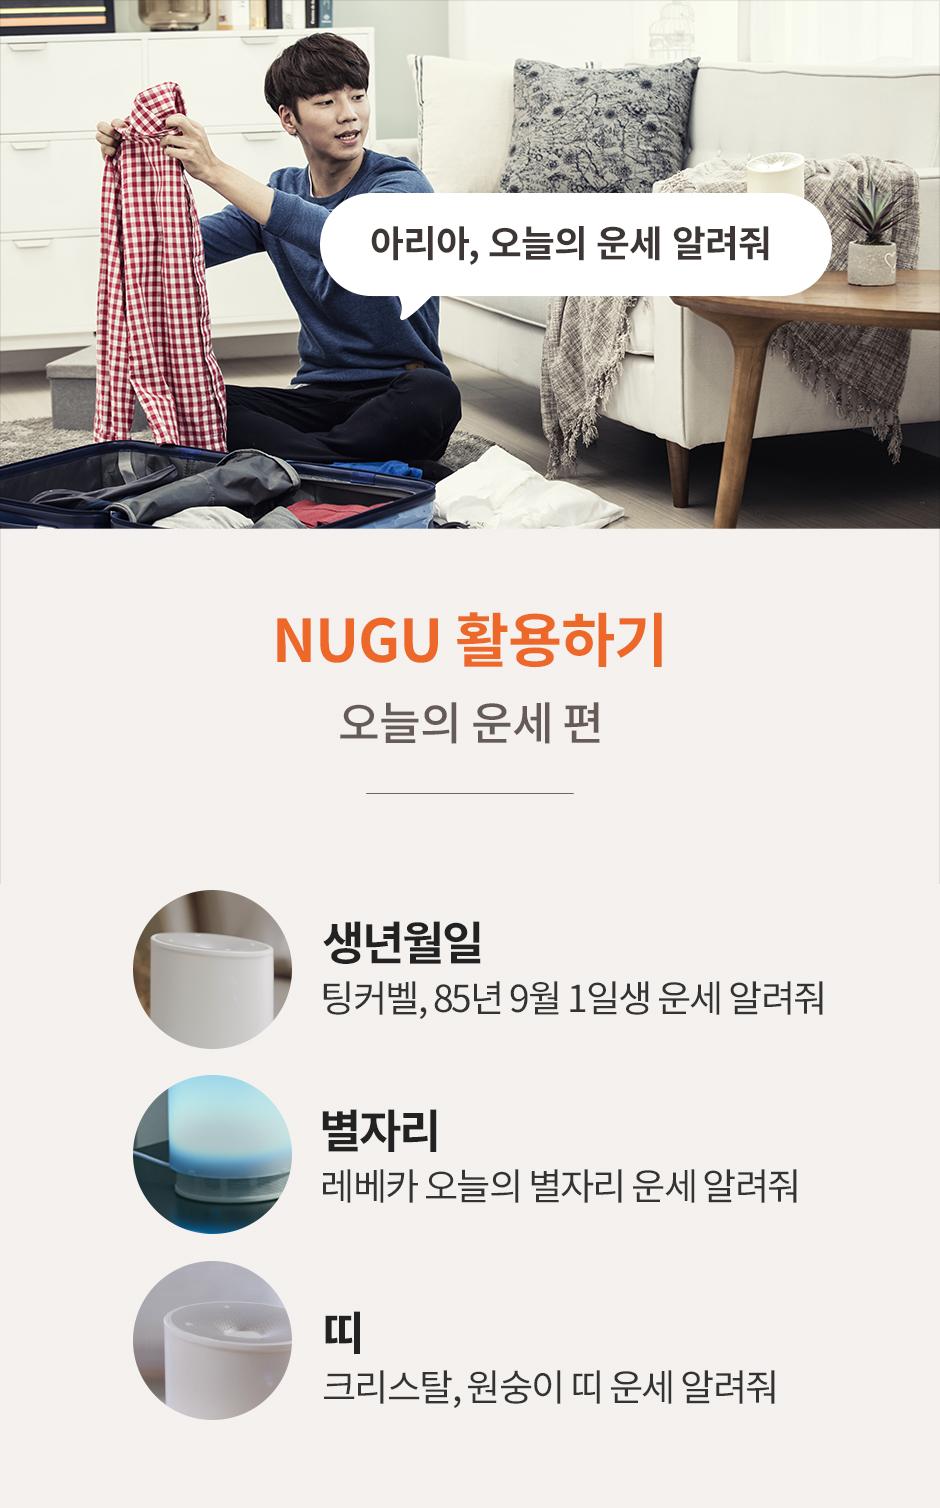 170413-nugu-new-5